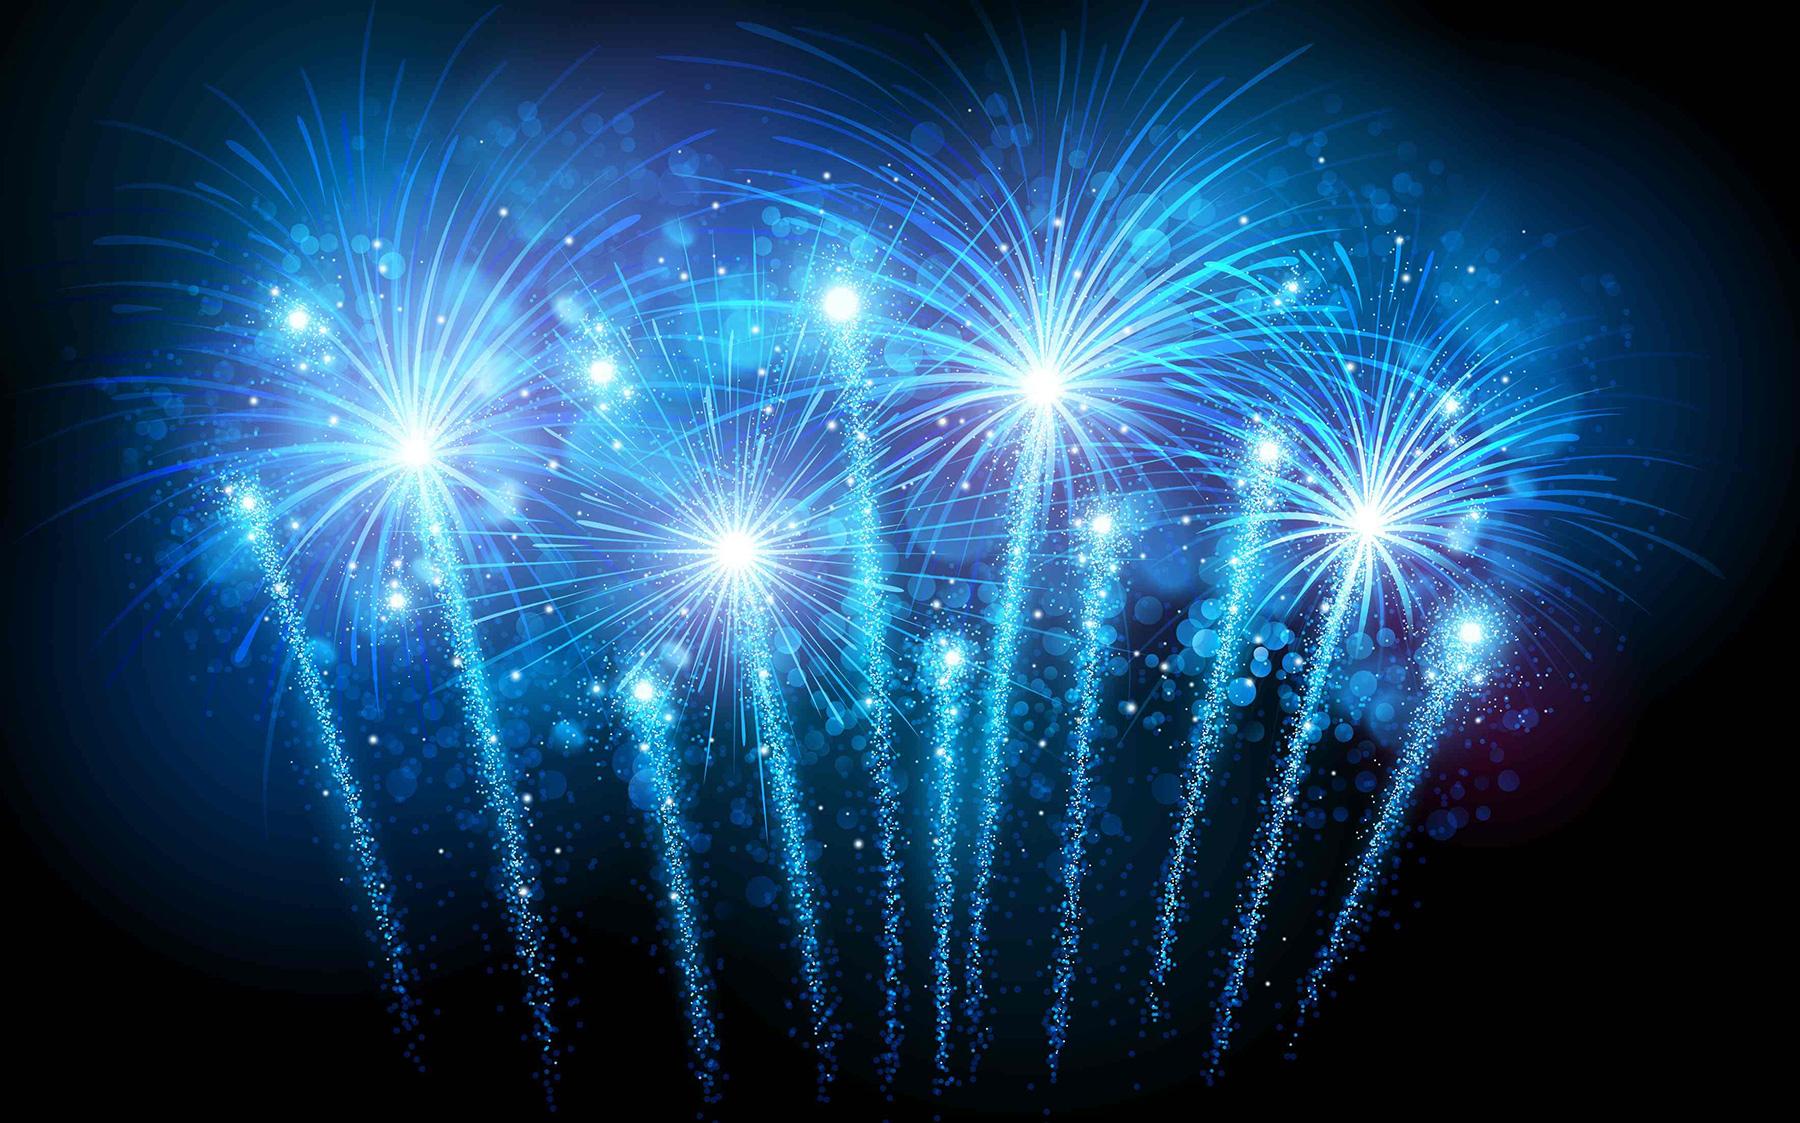 Fireworks HD Blue Backgrounds